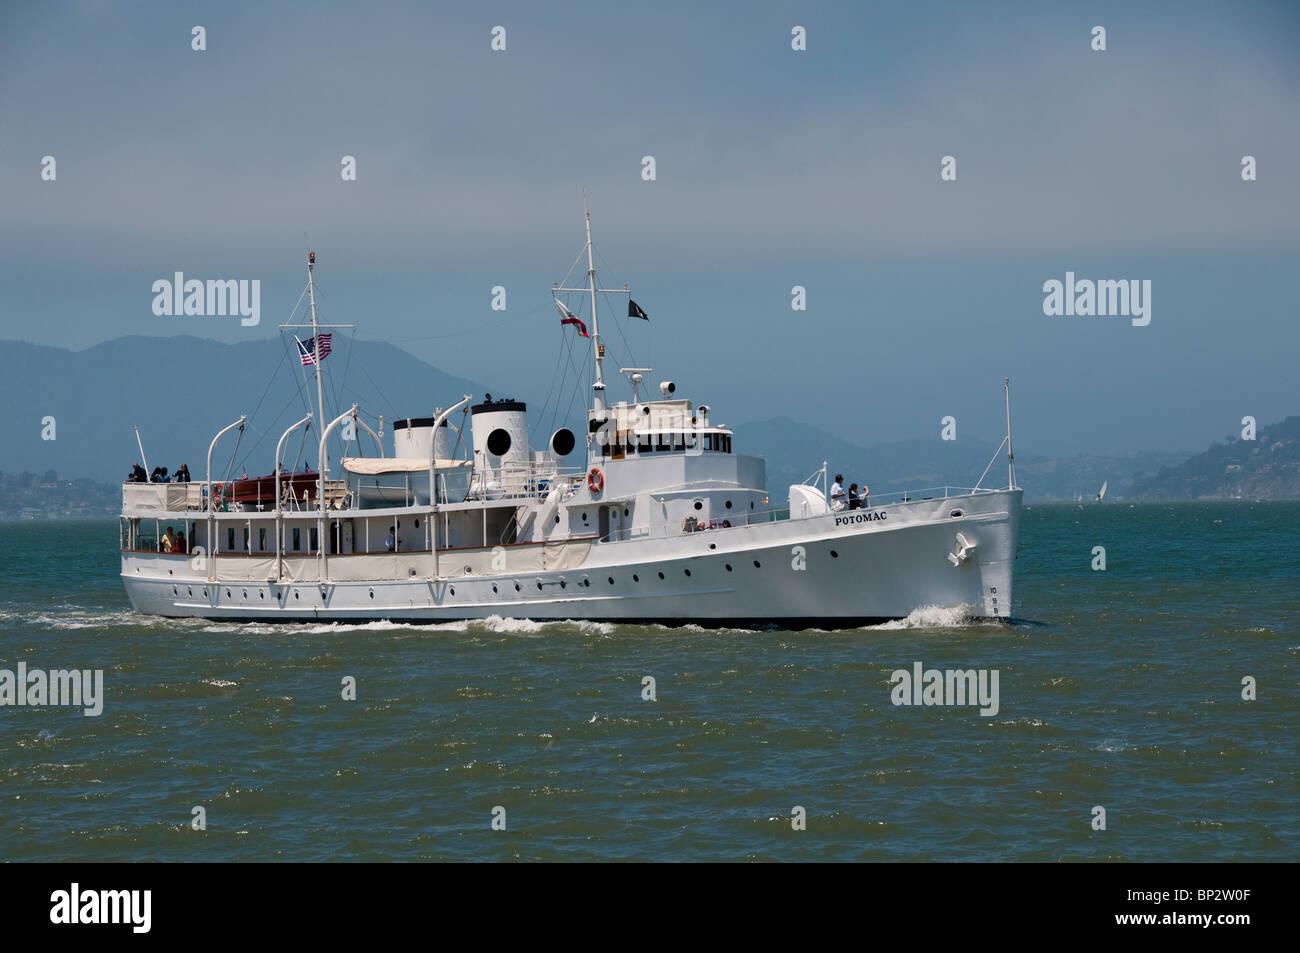 San Francisco: Excursion boat FDR's Potomac on San Francisco Bay. Photo copyright Lee Foster. Photo # casanf104139. - Stock Image